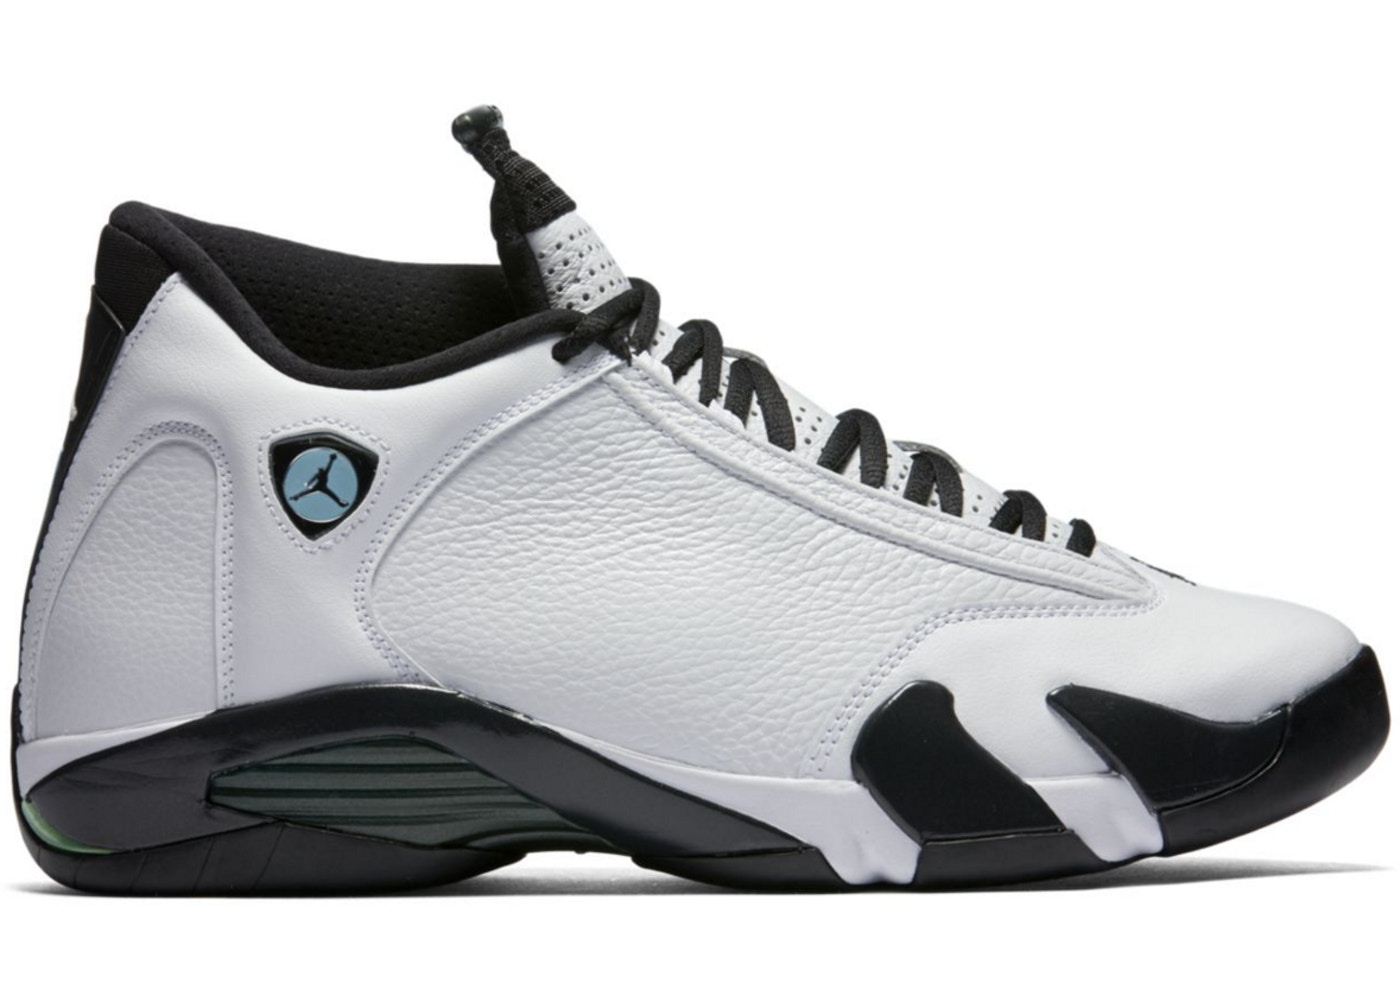 Air Jordan 14 Oxidized -